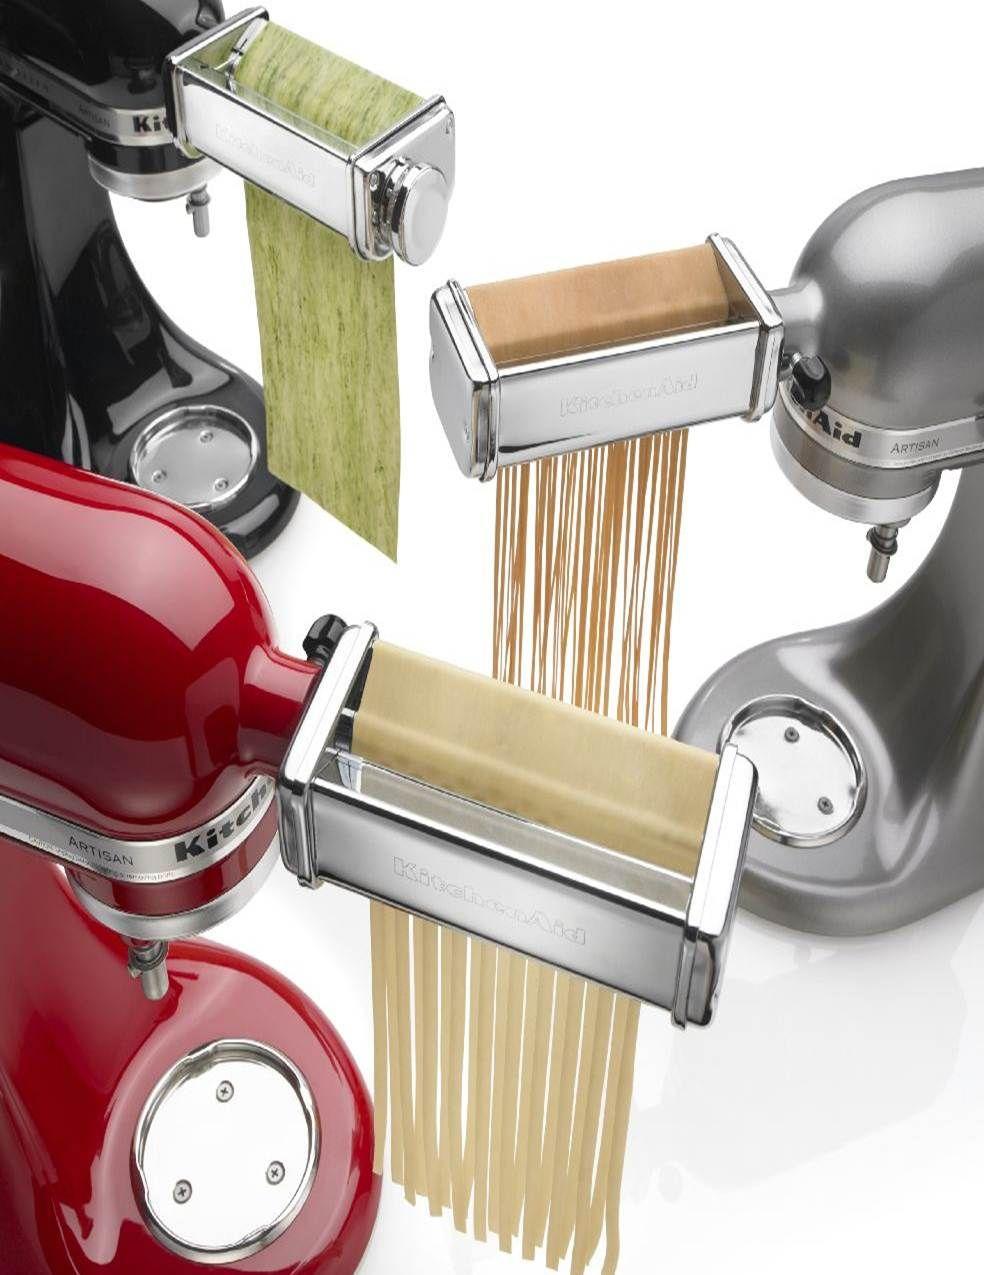 Three Piece Set Includes Pasta Roller Fettucine Cutter